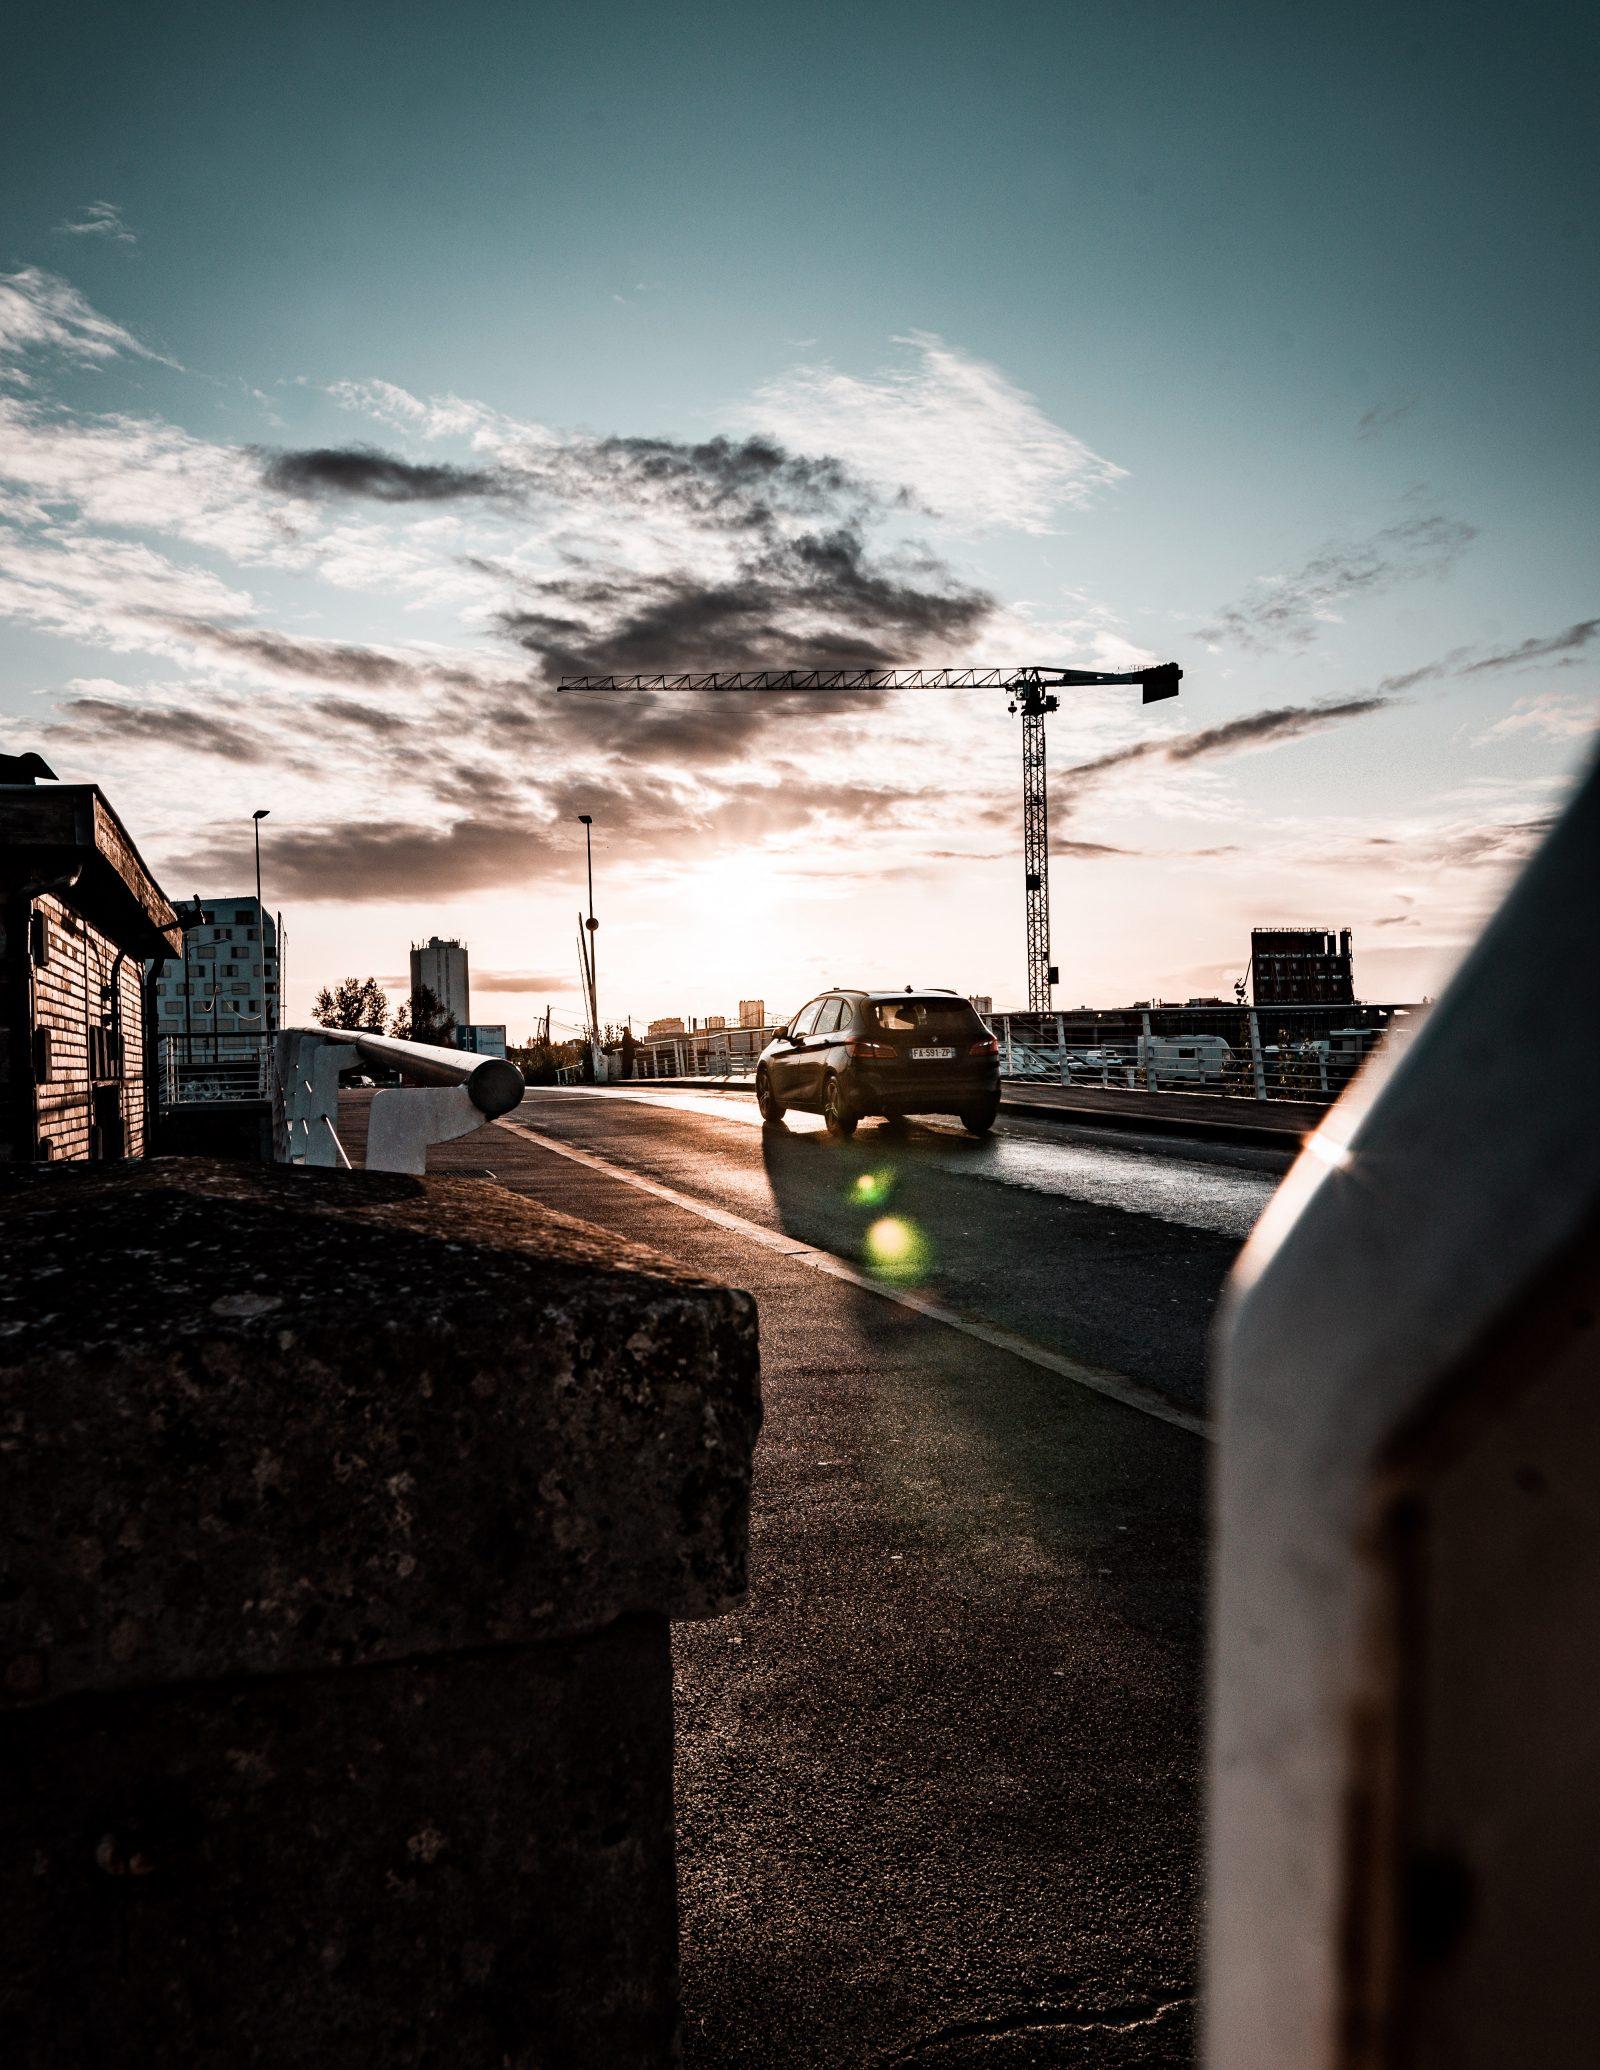 Sunrise over a car